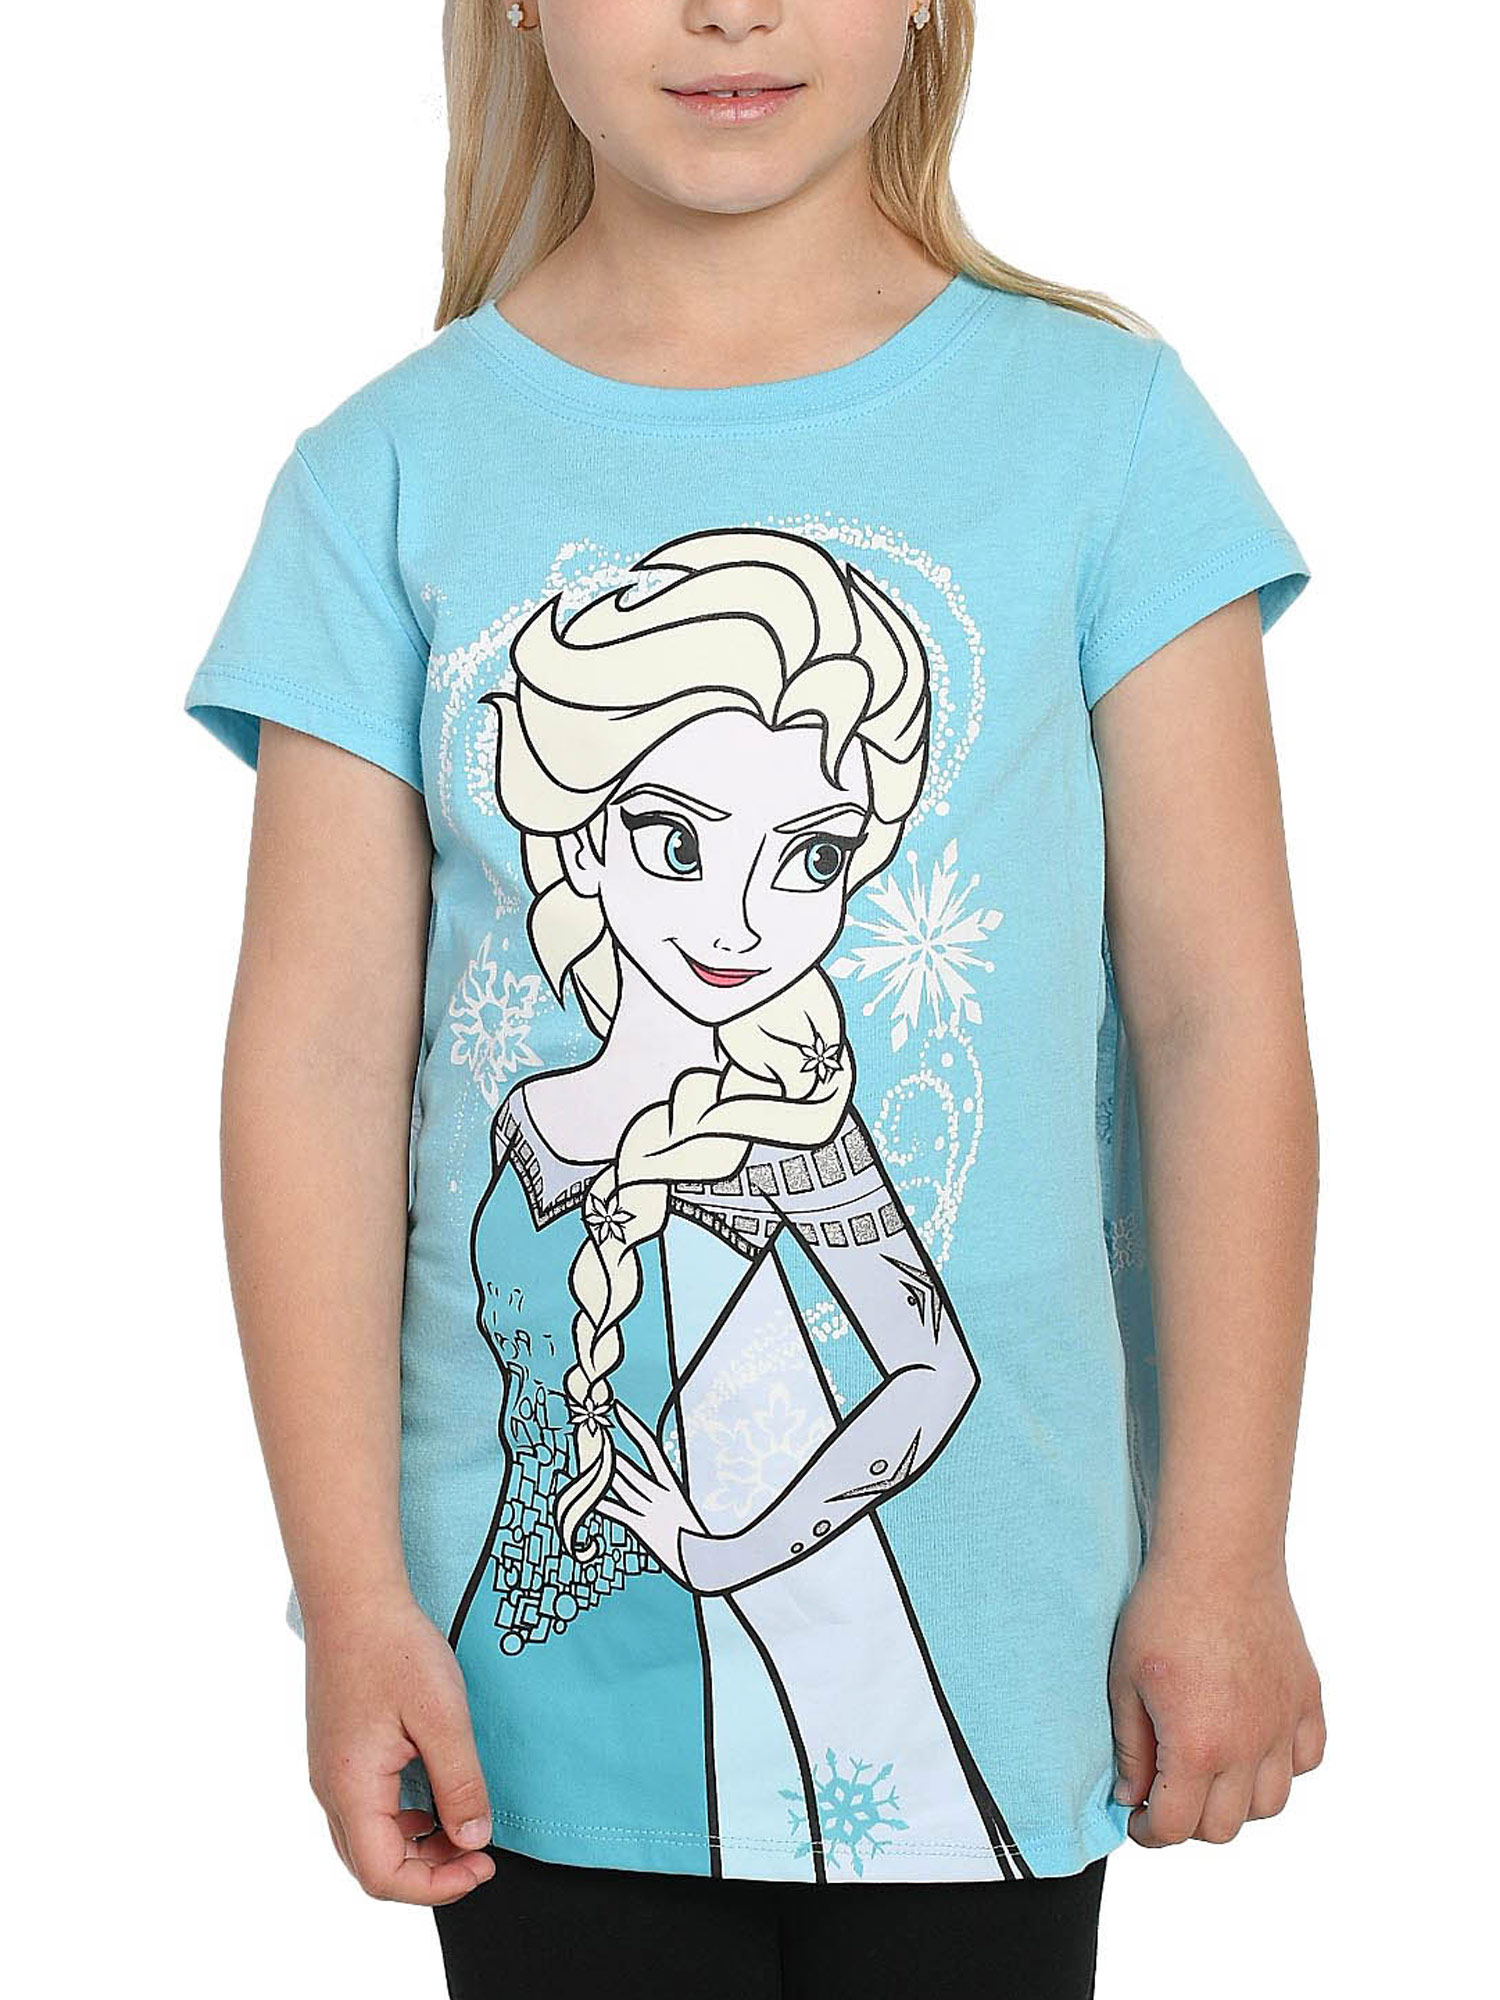 NEW Girls Graphic T-Shirt Small 6-6X Blue Frozen Princess Elsa Top Shine